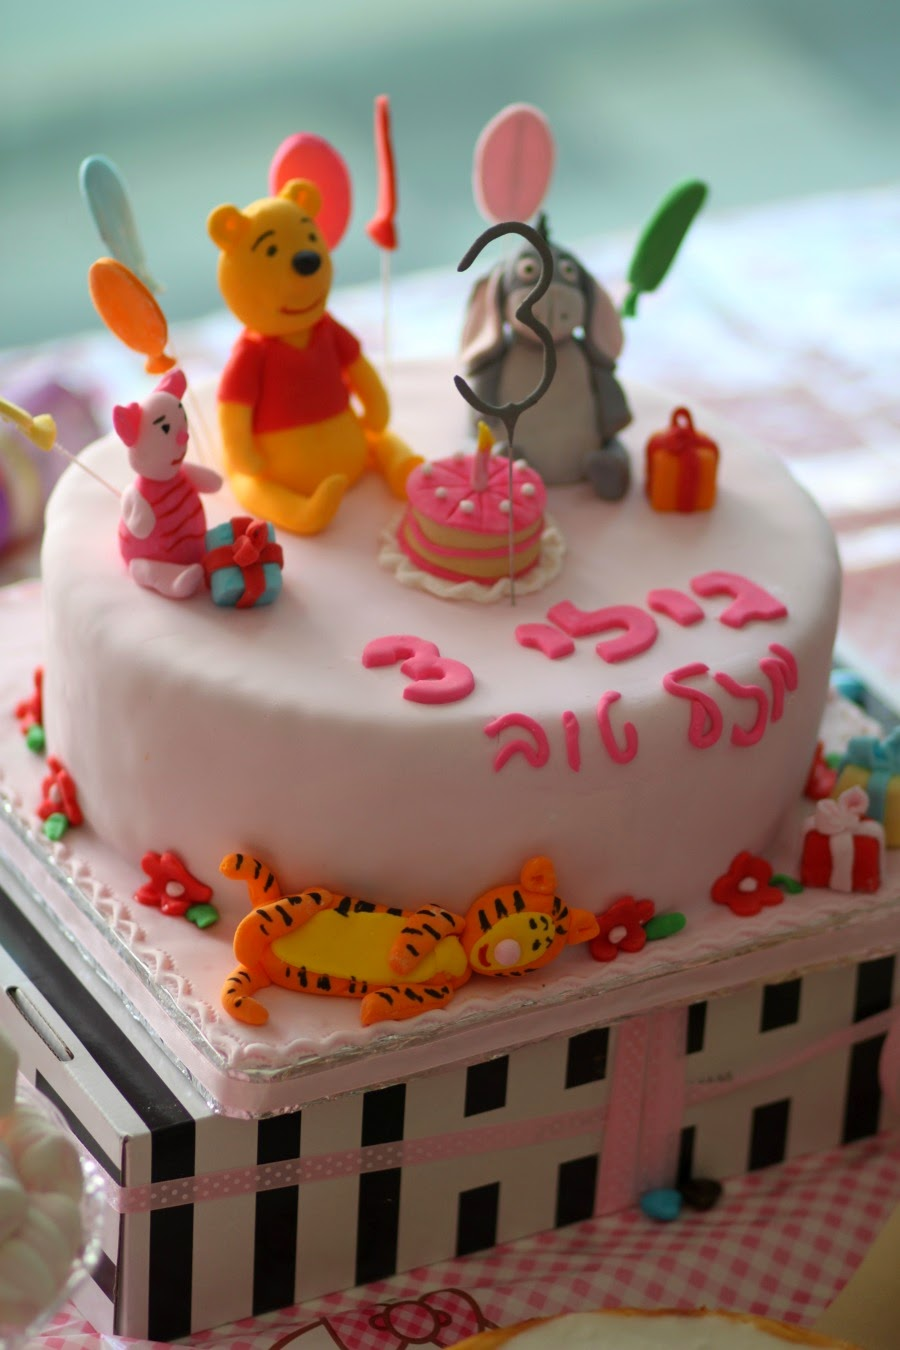 decoration, decor, girlbirthdayparty, cupcakes, sweets, celebration, happy, blog, fashionblog, ארגוןיוםהולדתלילדה, בלוג, דקורציה